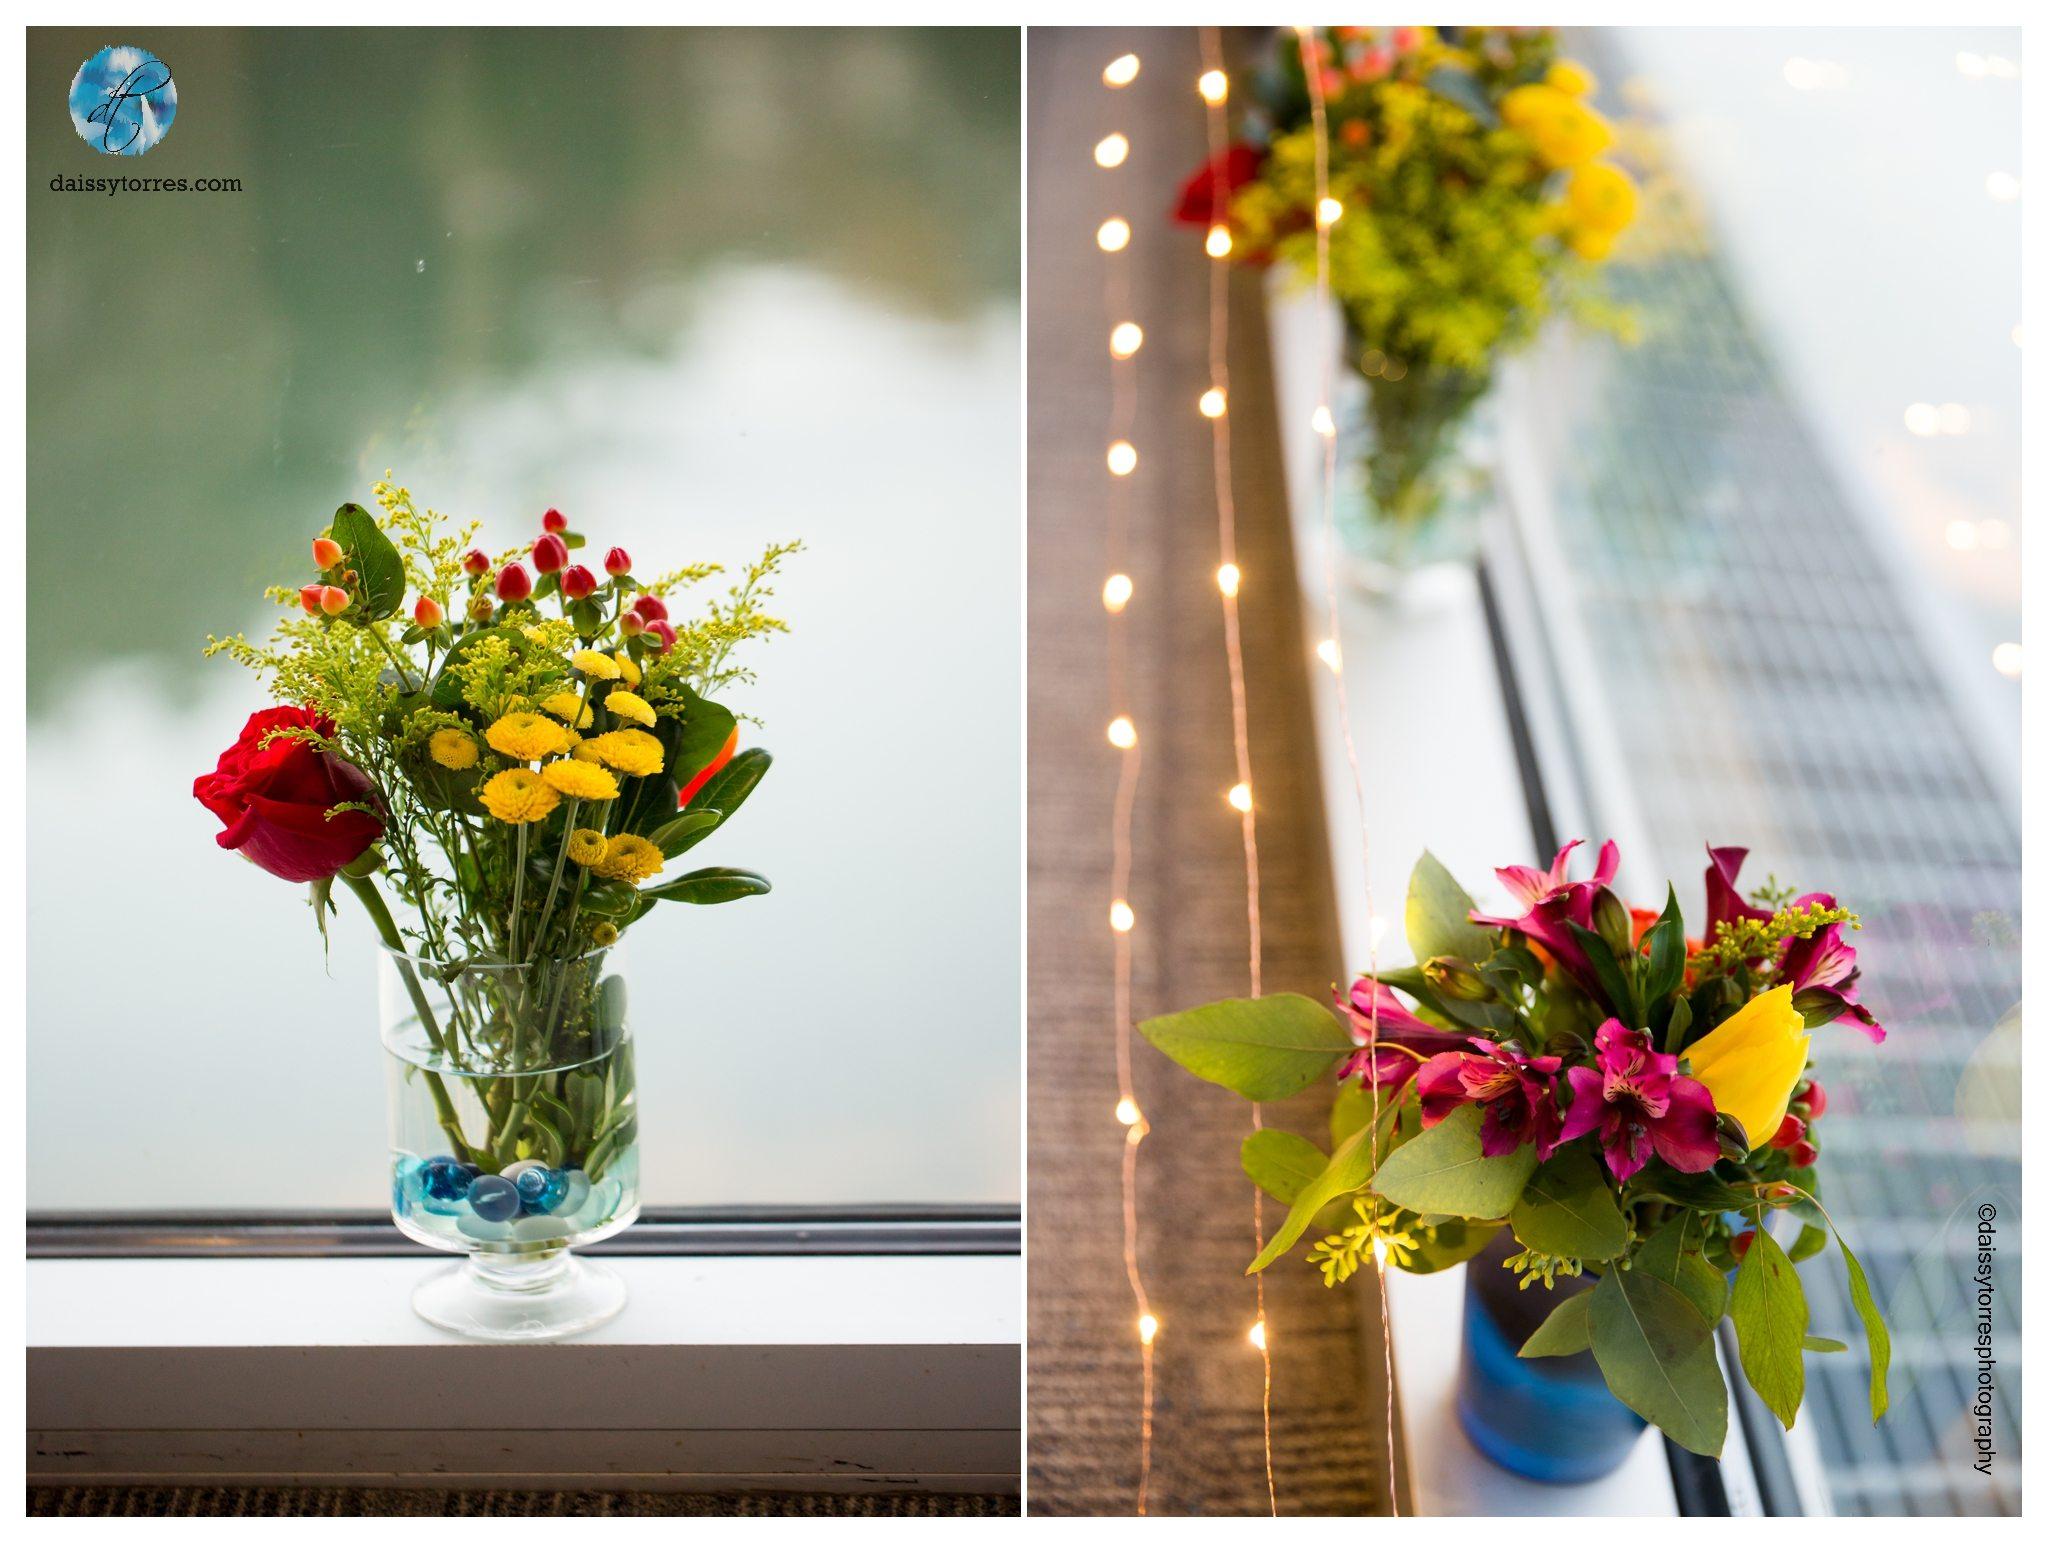 Virginia Aquarium Wedding - Do it yourself wedding decor